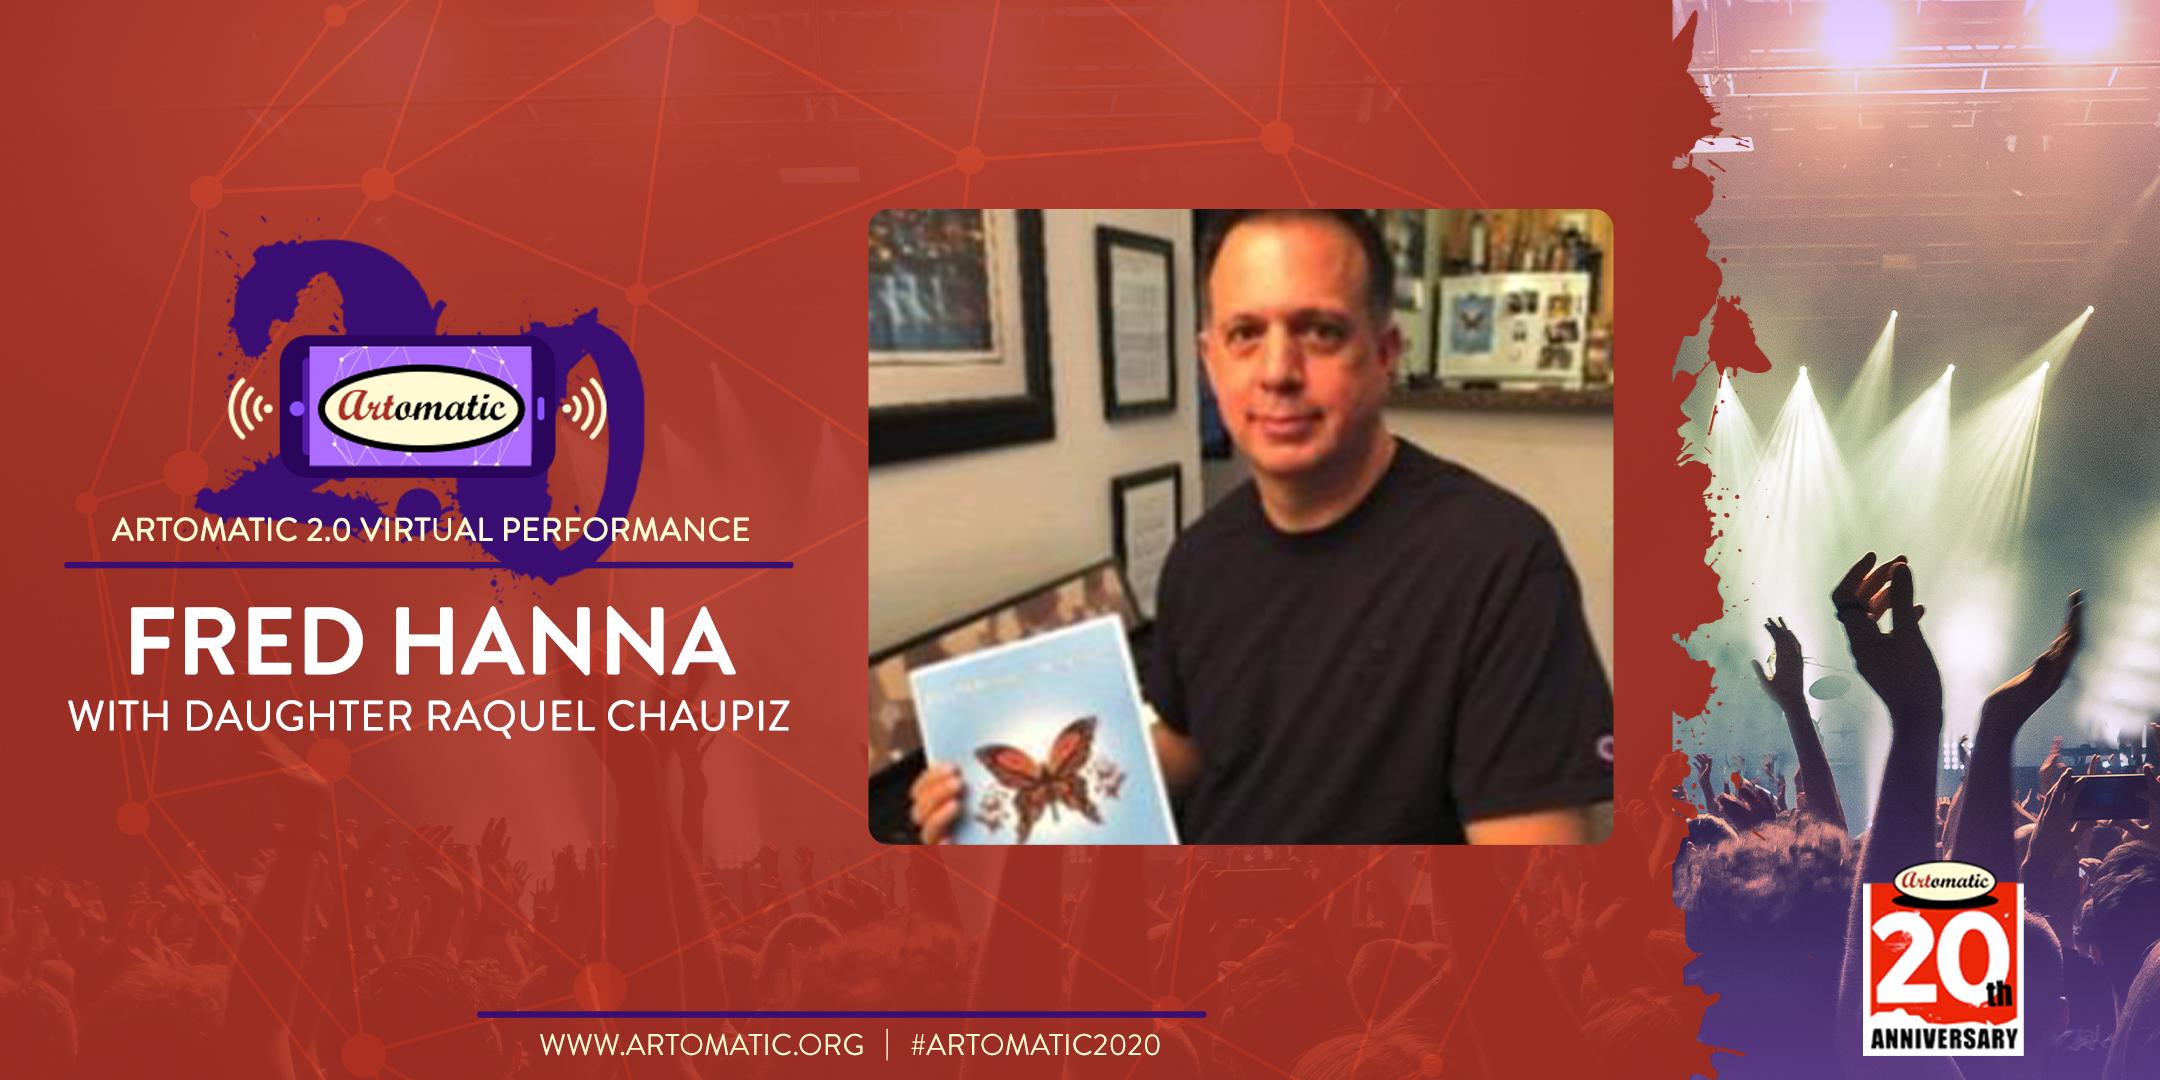 Performance: Artomatic 2.0 Performance: Fred Hanna & Raquel Chaupiz (YouTube)